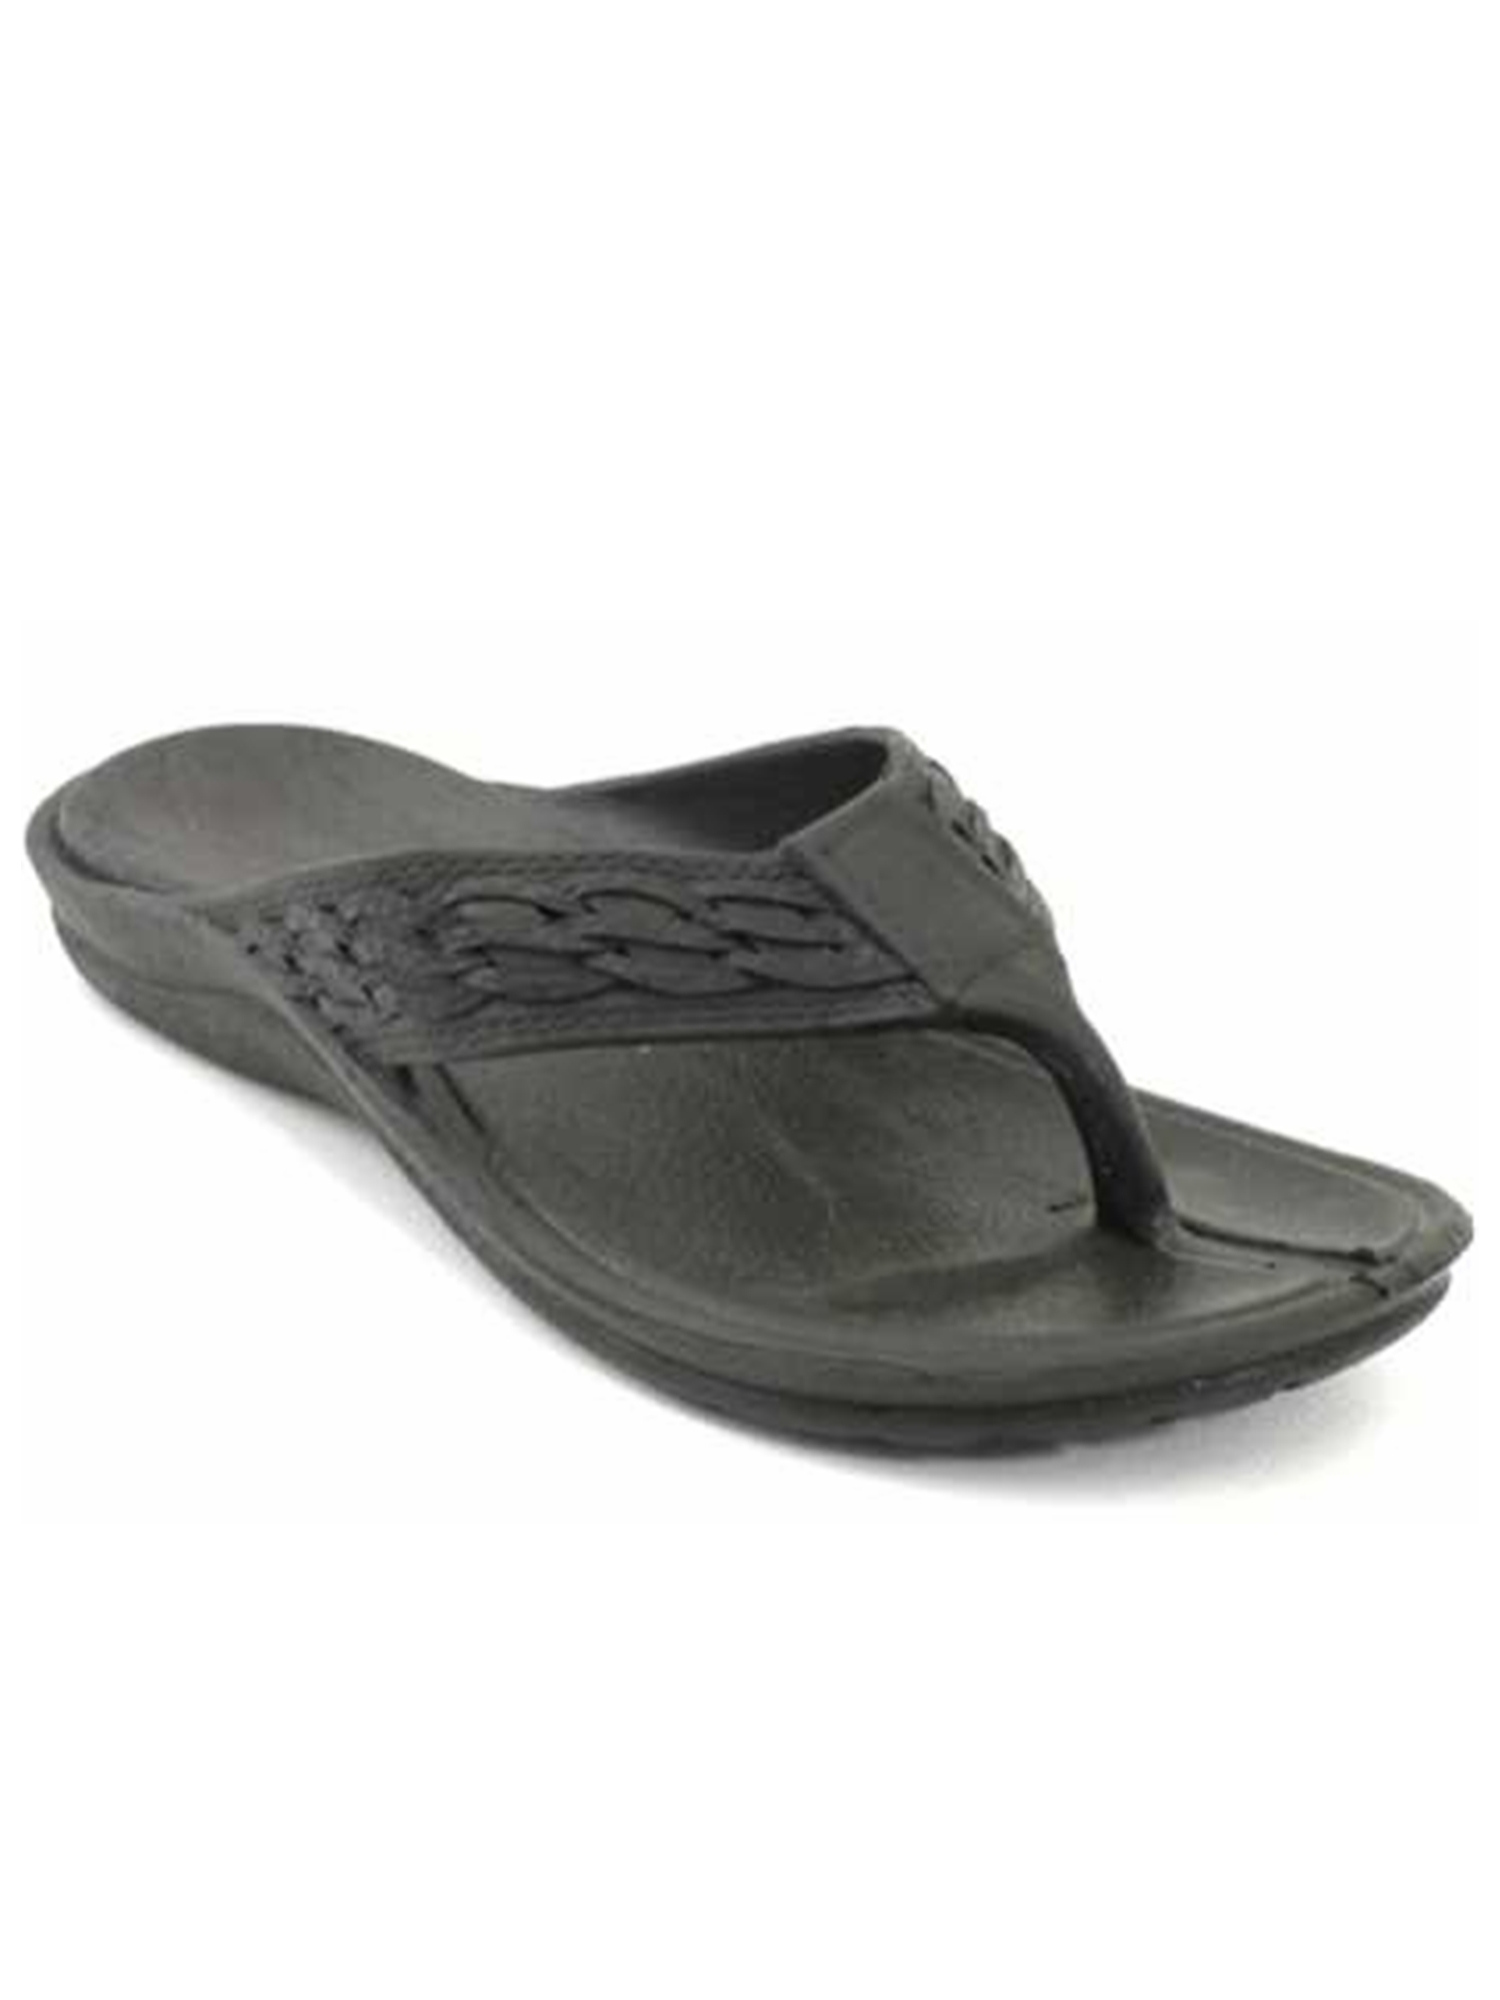 Pali Hawaii Unisex PH 198 Thong Sandal-Black-Size 12